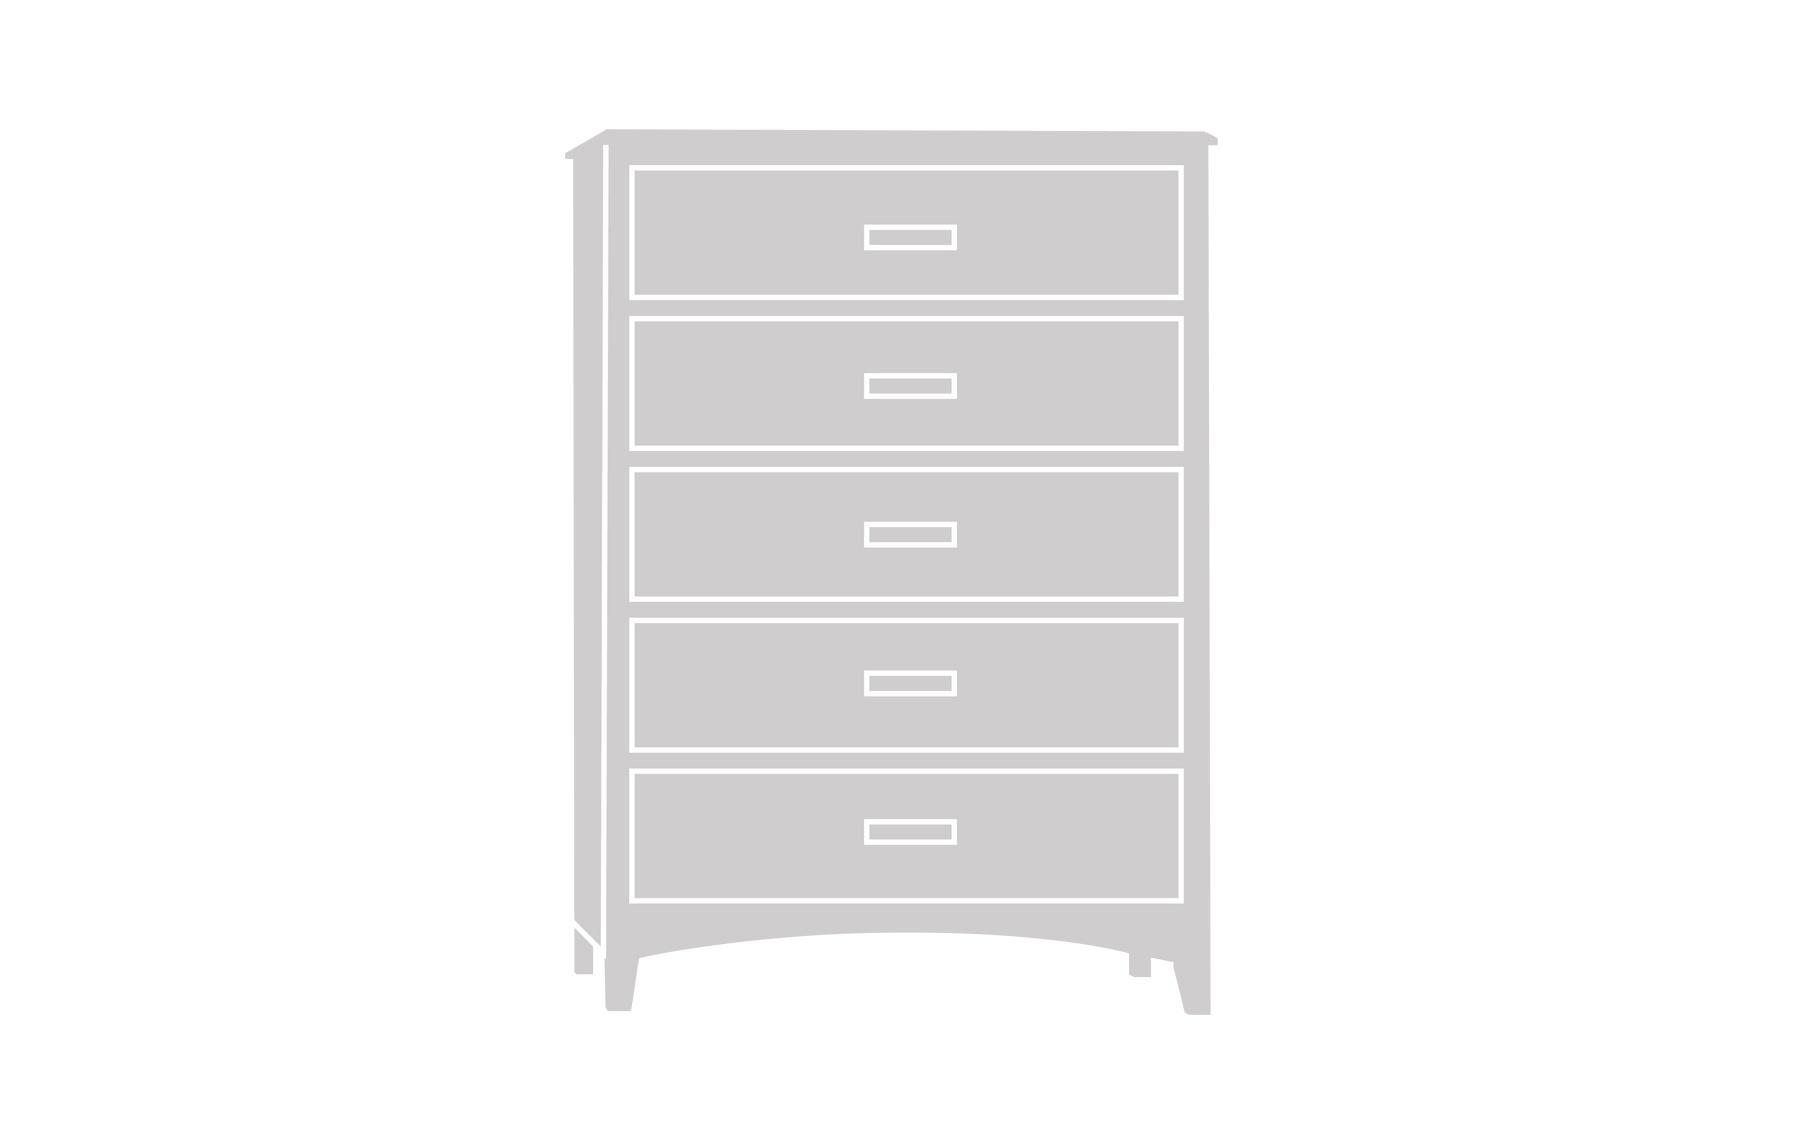 commode haute 7 tiroirs 23x19 co564a commode haute chambres la galerie du meuble. Black Bedroom Furniture Sets. Home Design Ideas